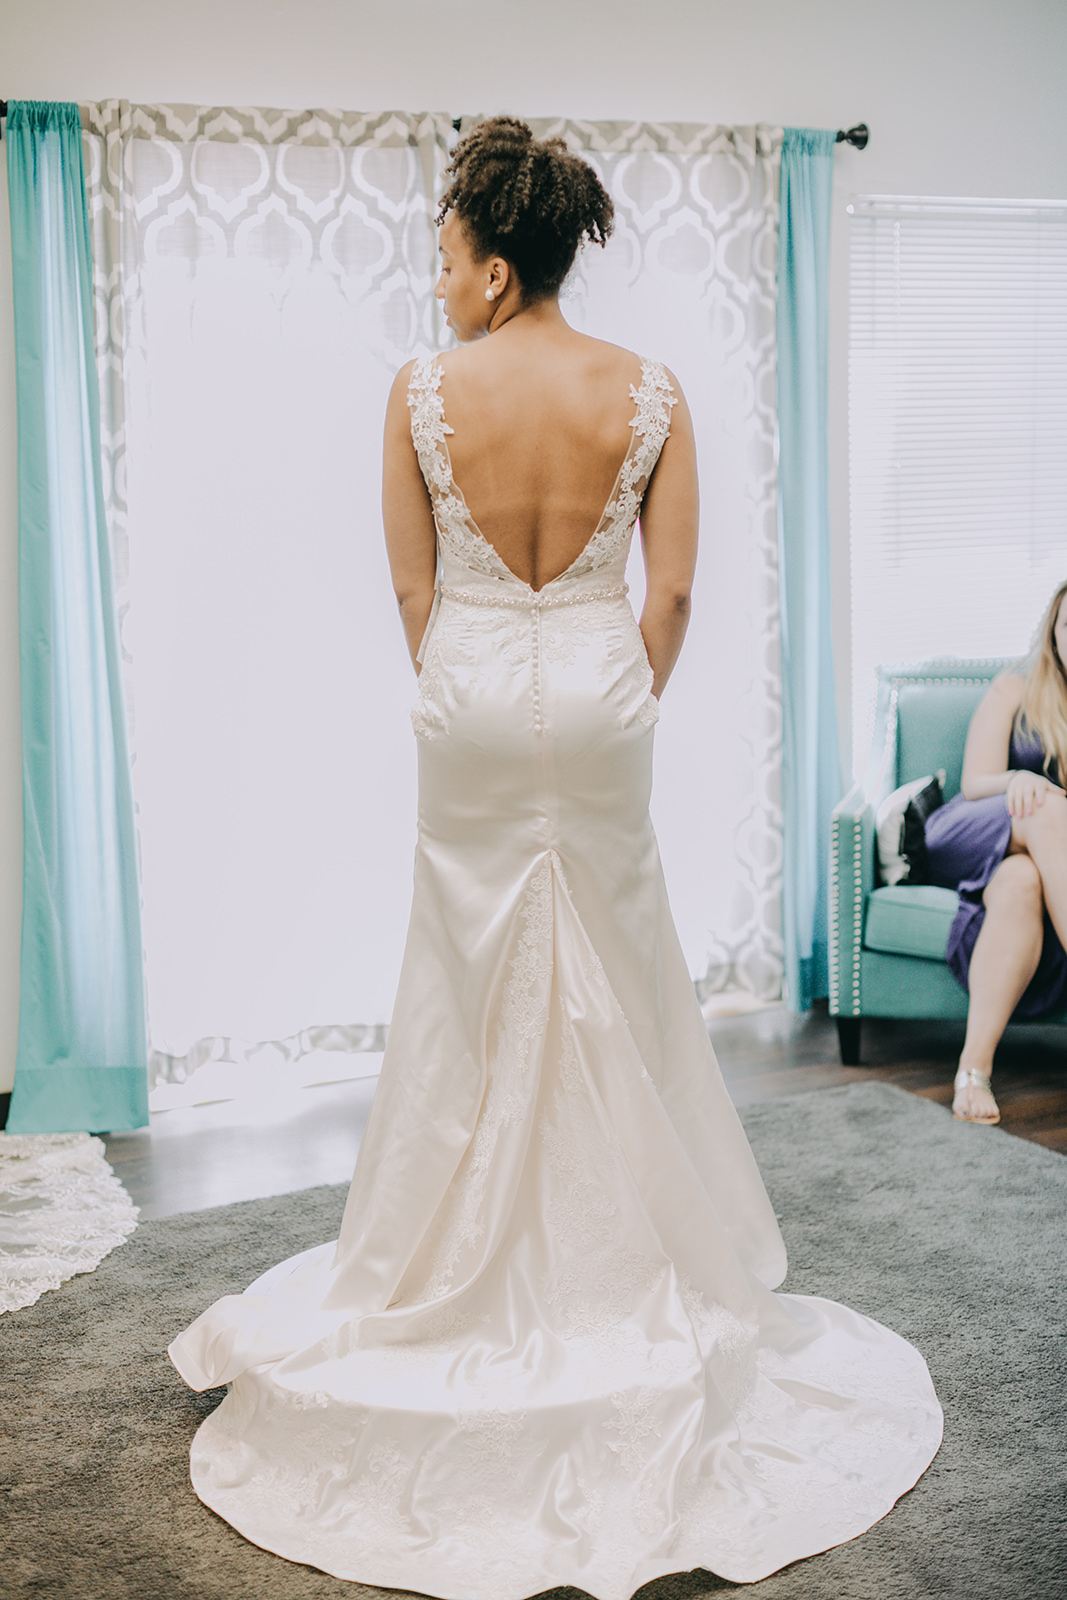 2018 0708 Brilliant Bridal 0037.jpg